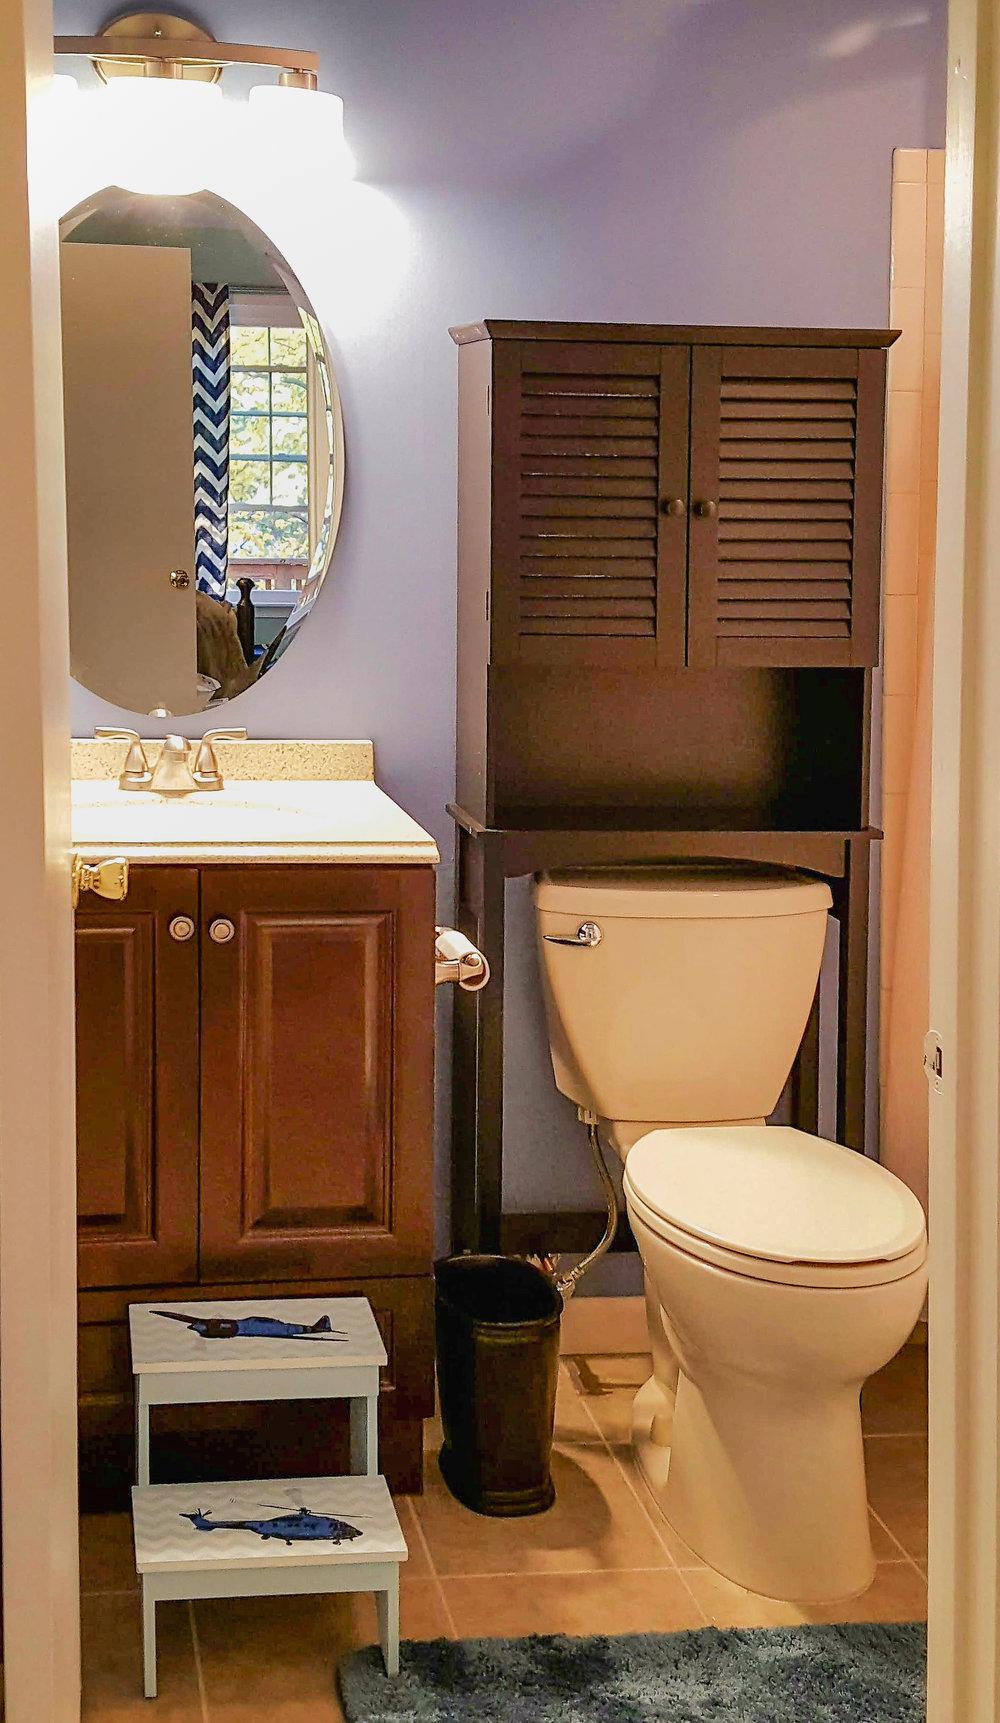 Bathroom Renovation PSX_20161011_065452.jpg